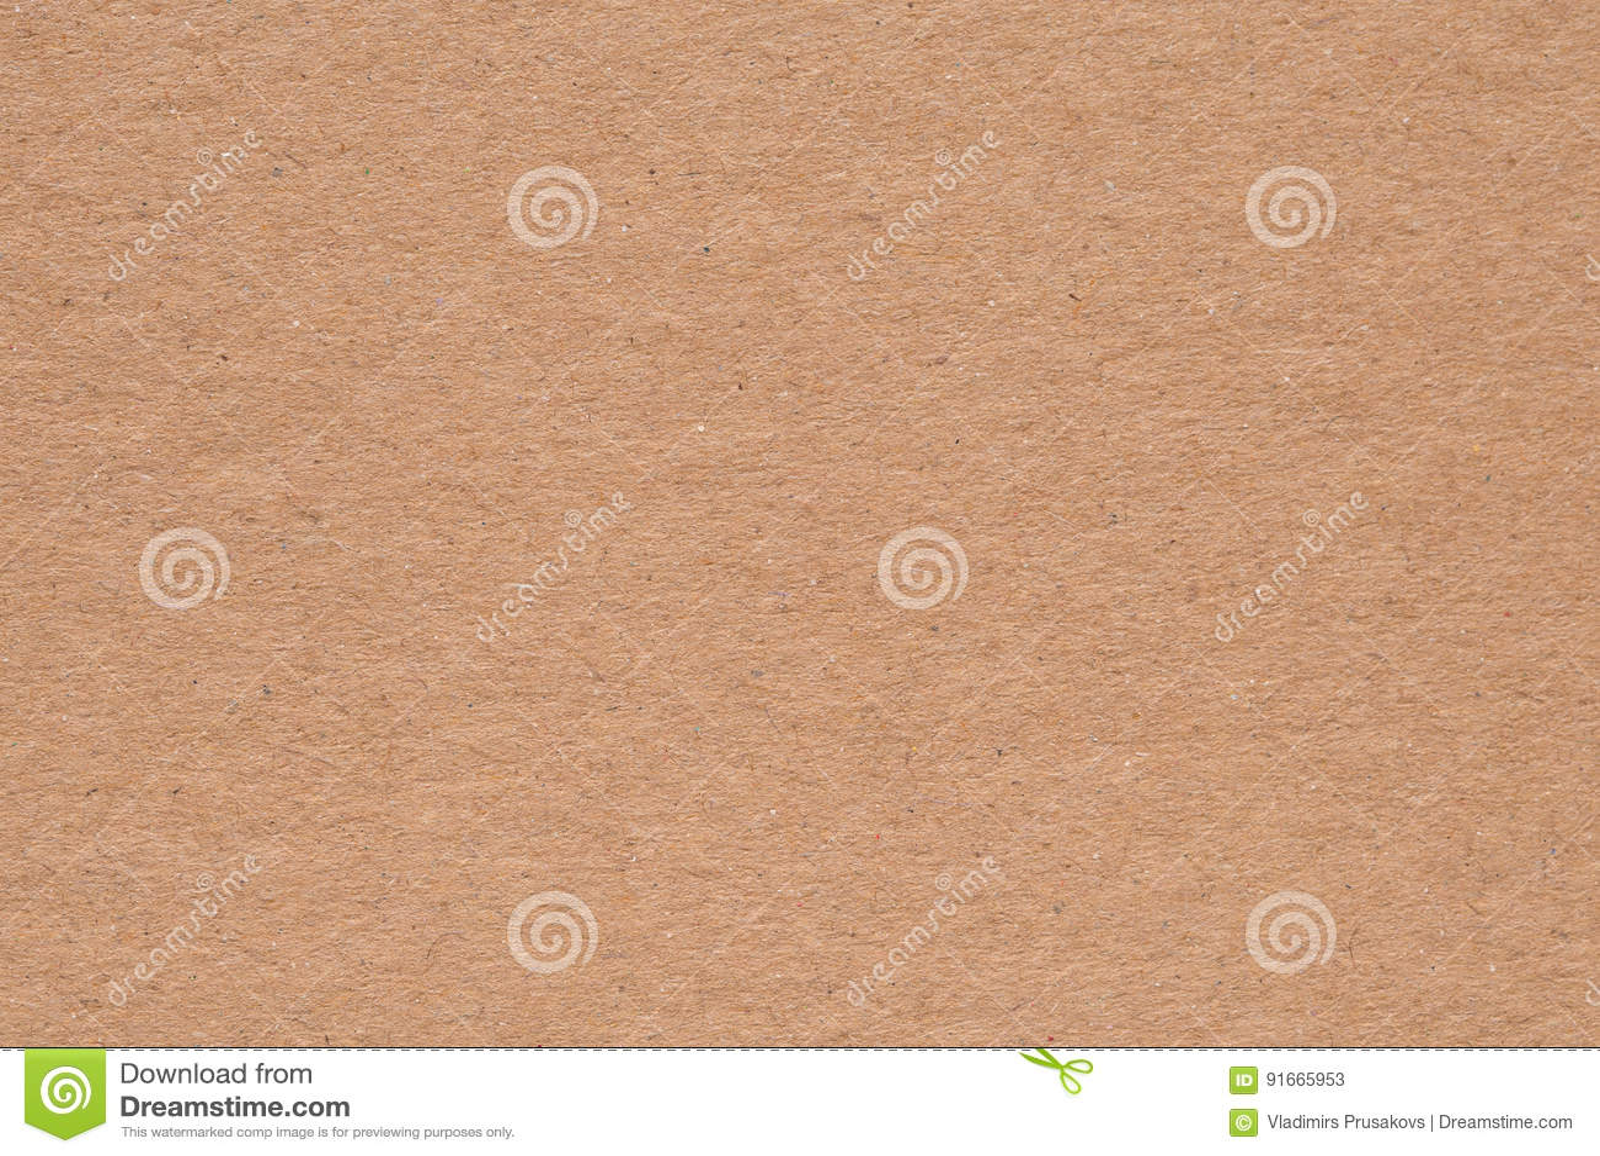 Cardboard Texture Background, Brown Paper Carton